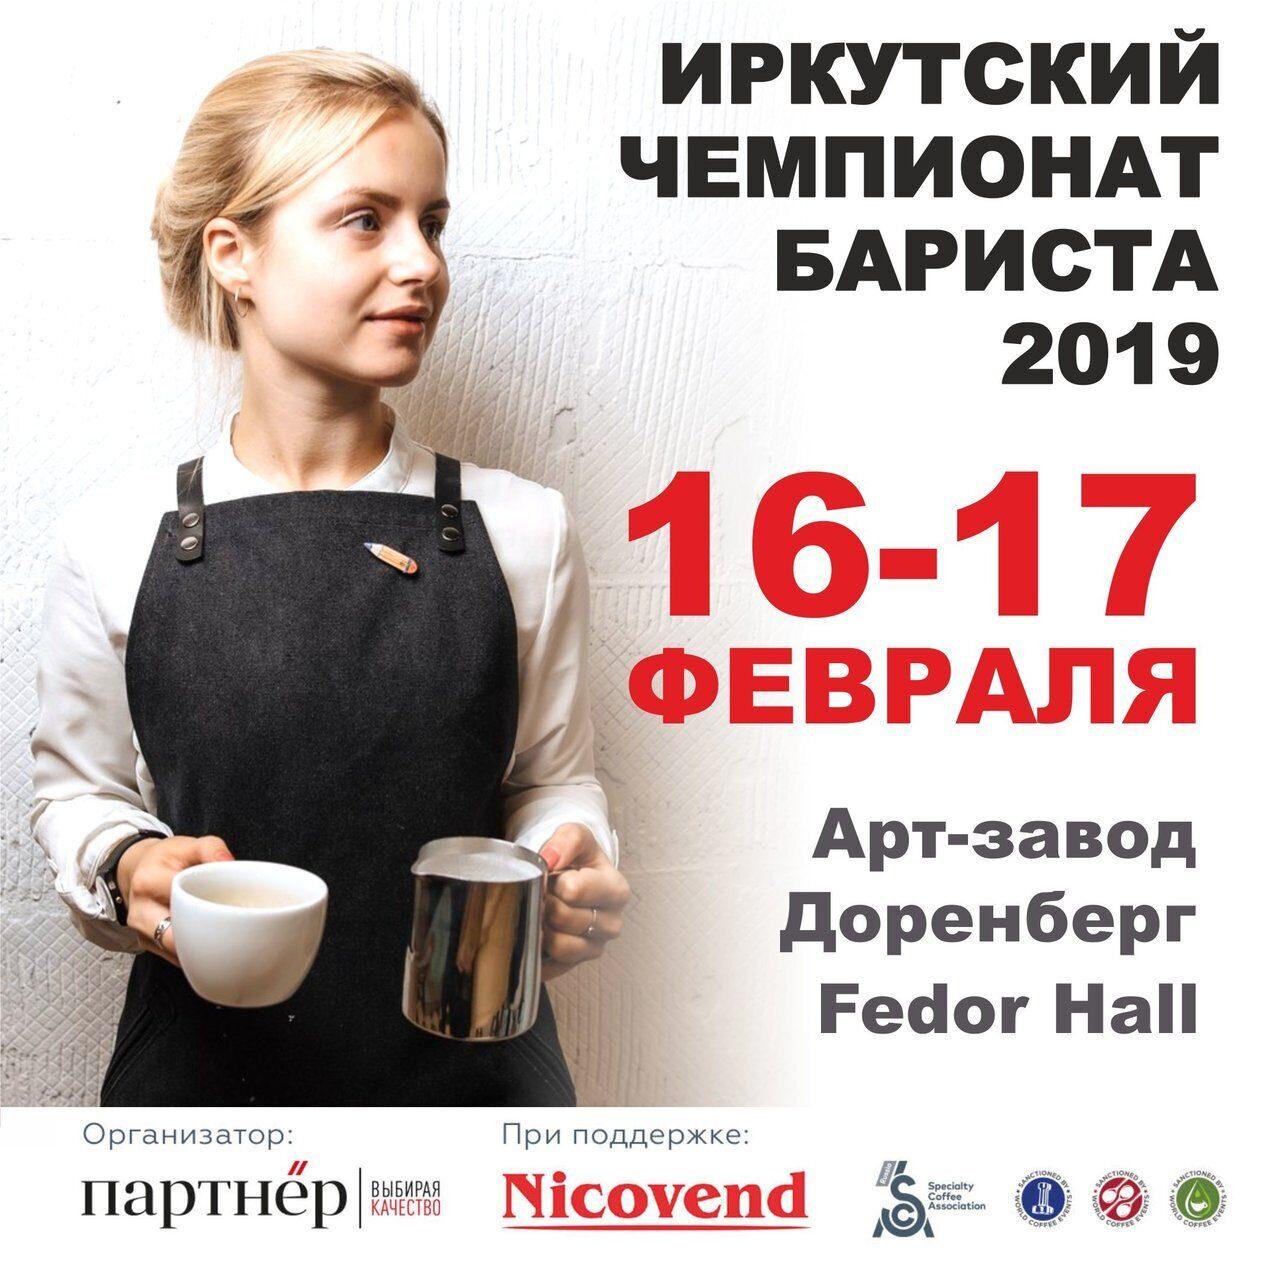 иркутский чемпионат бариста 2019 никовенд